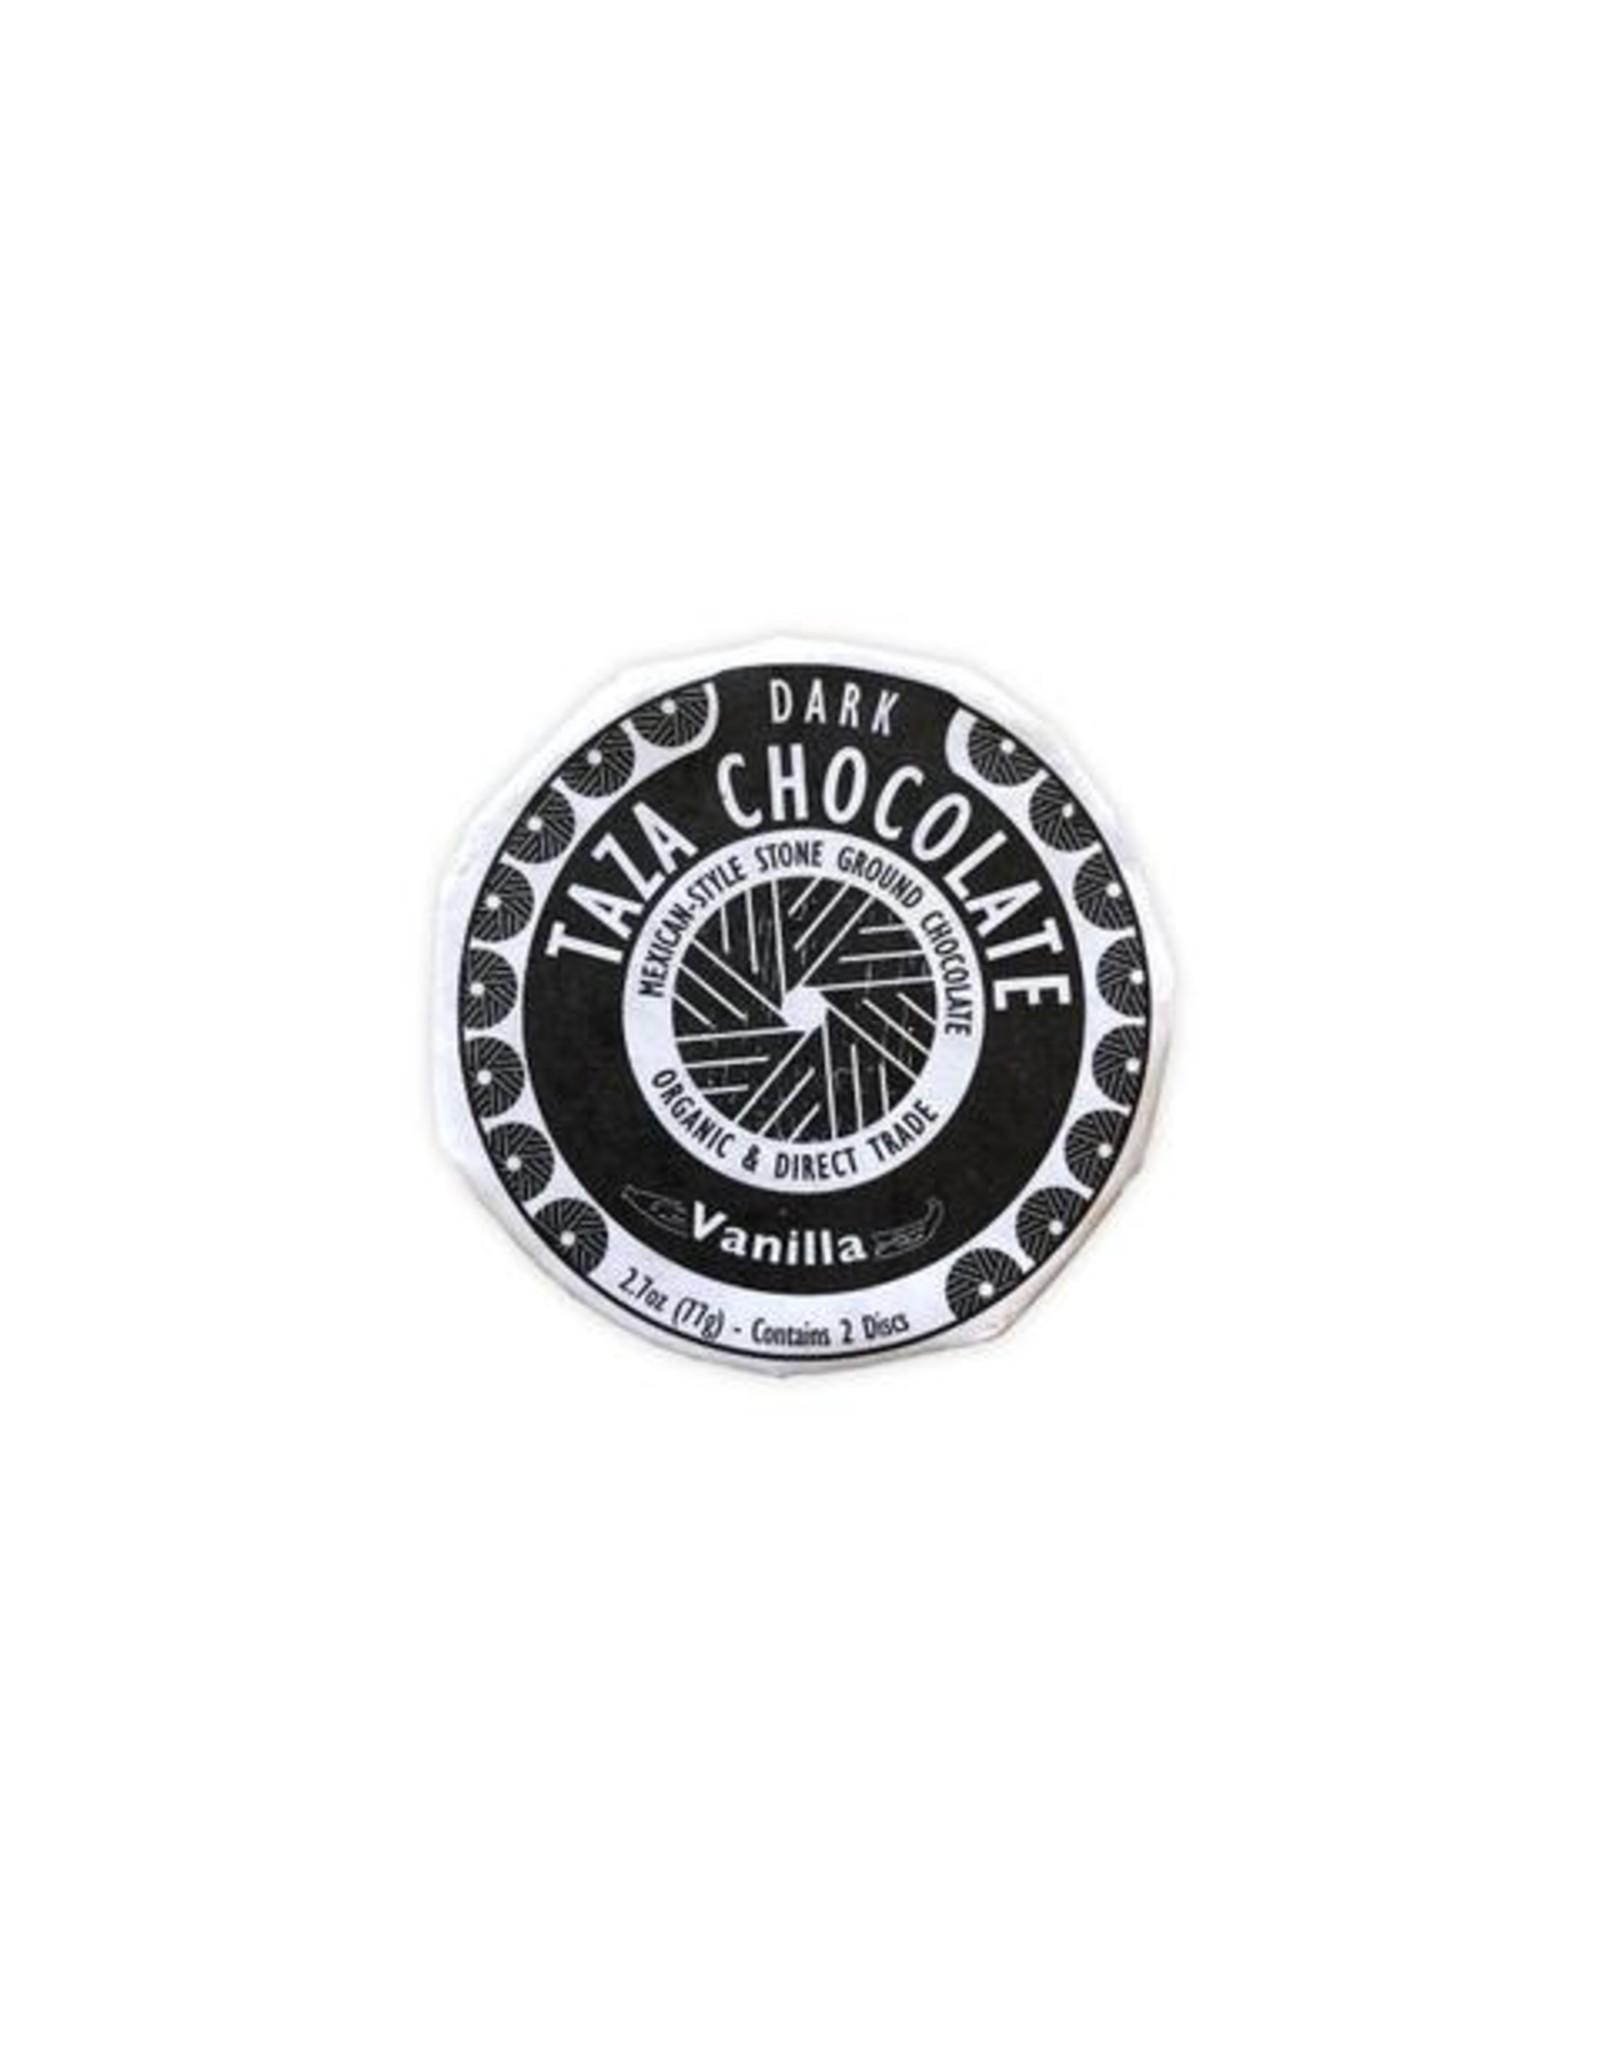 Taza Chocolate Taza Organic Dark Chocolate Disc with Vanilla